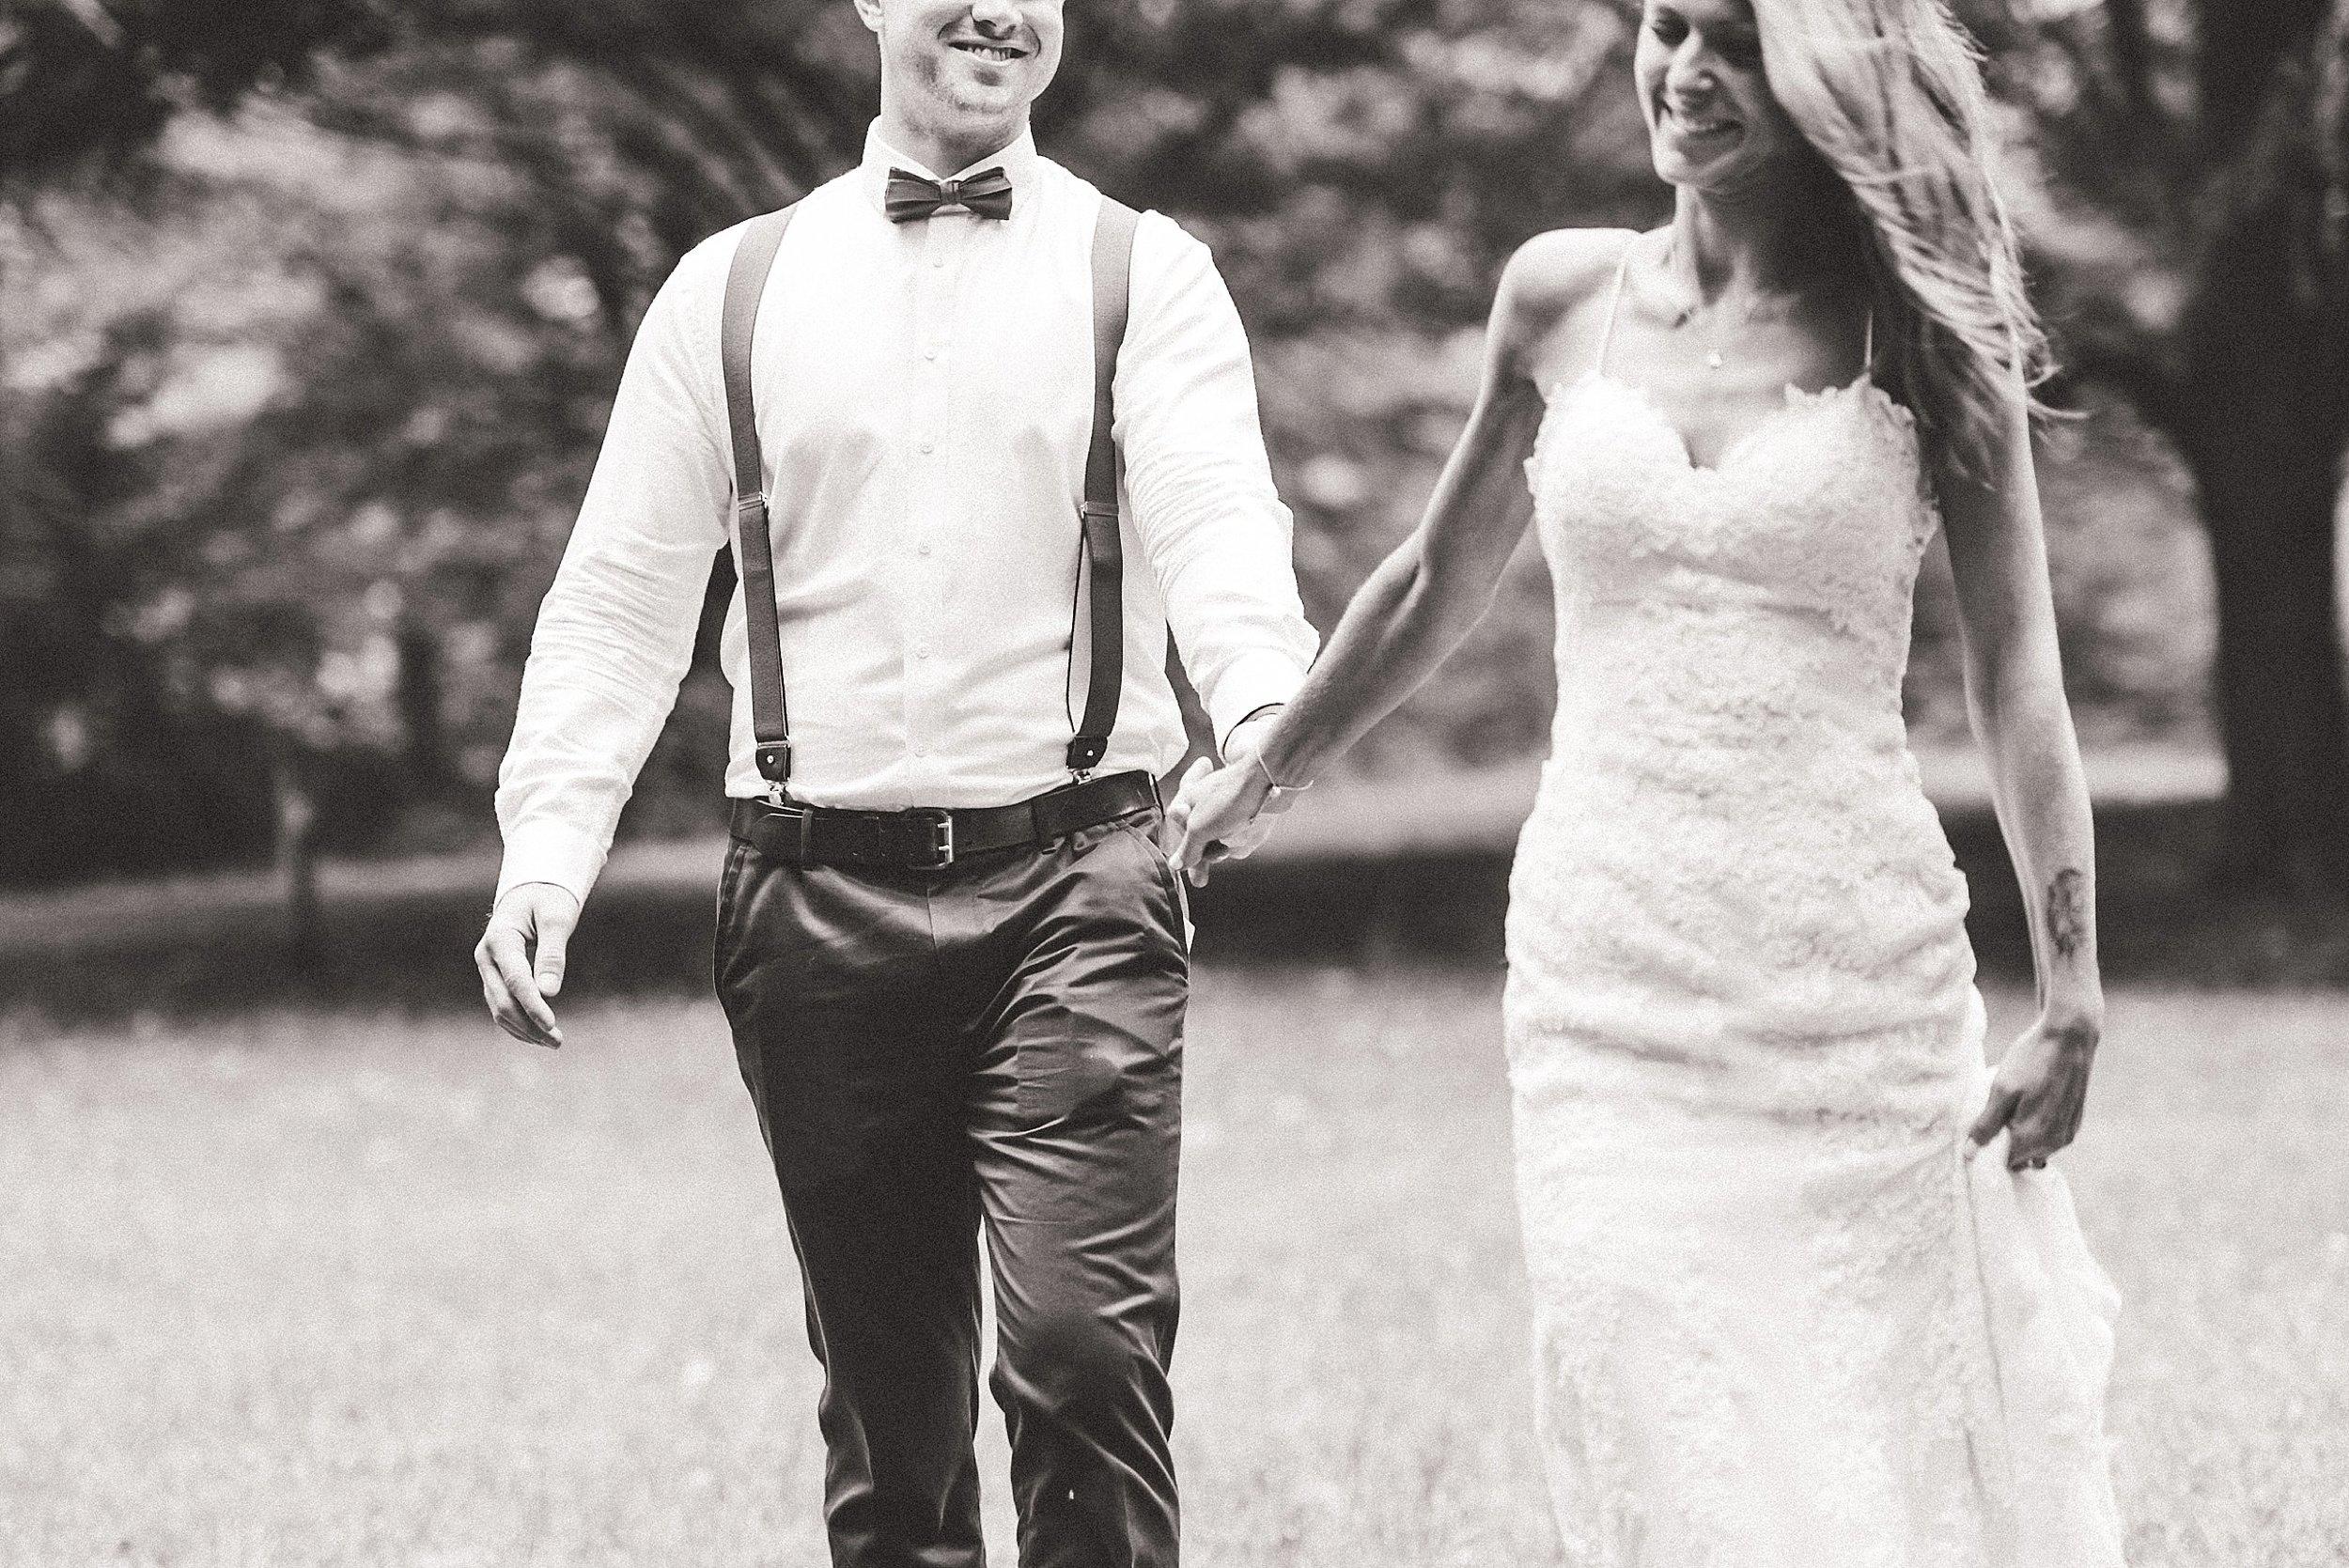 Ottawa Wedding Photographer - Stanley's Olde Maple Lane Barn Wedding - Ali & Batoul Photography_0018.jpg